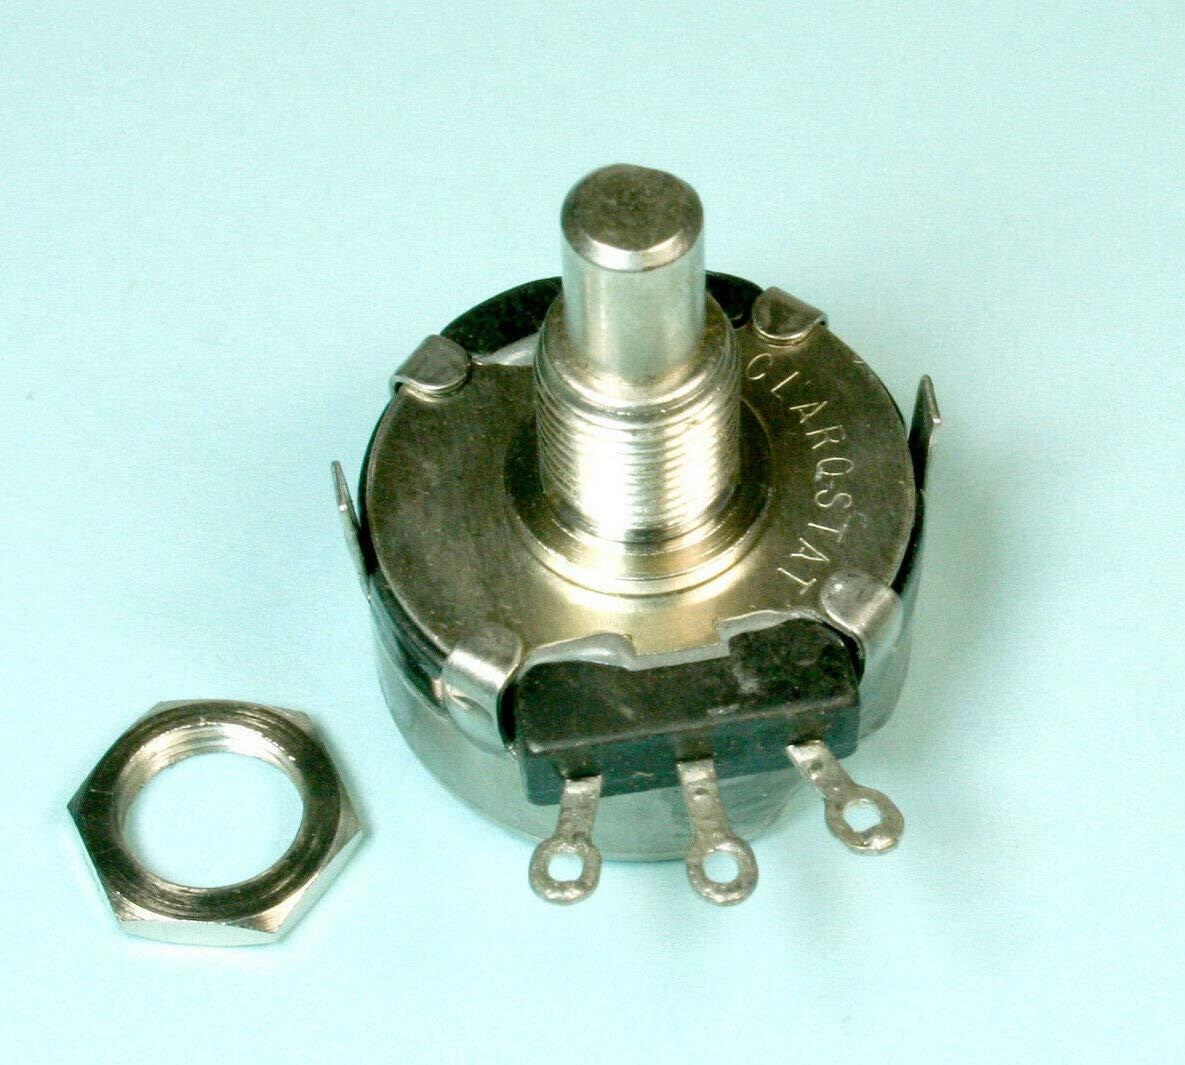 for sale online Clarostat Series 39 Potentiometer 1000 Ohms NOS